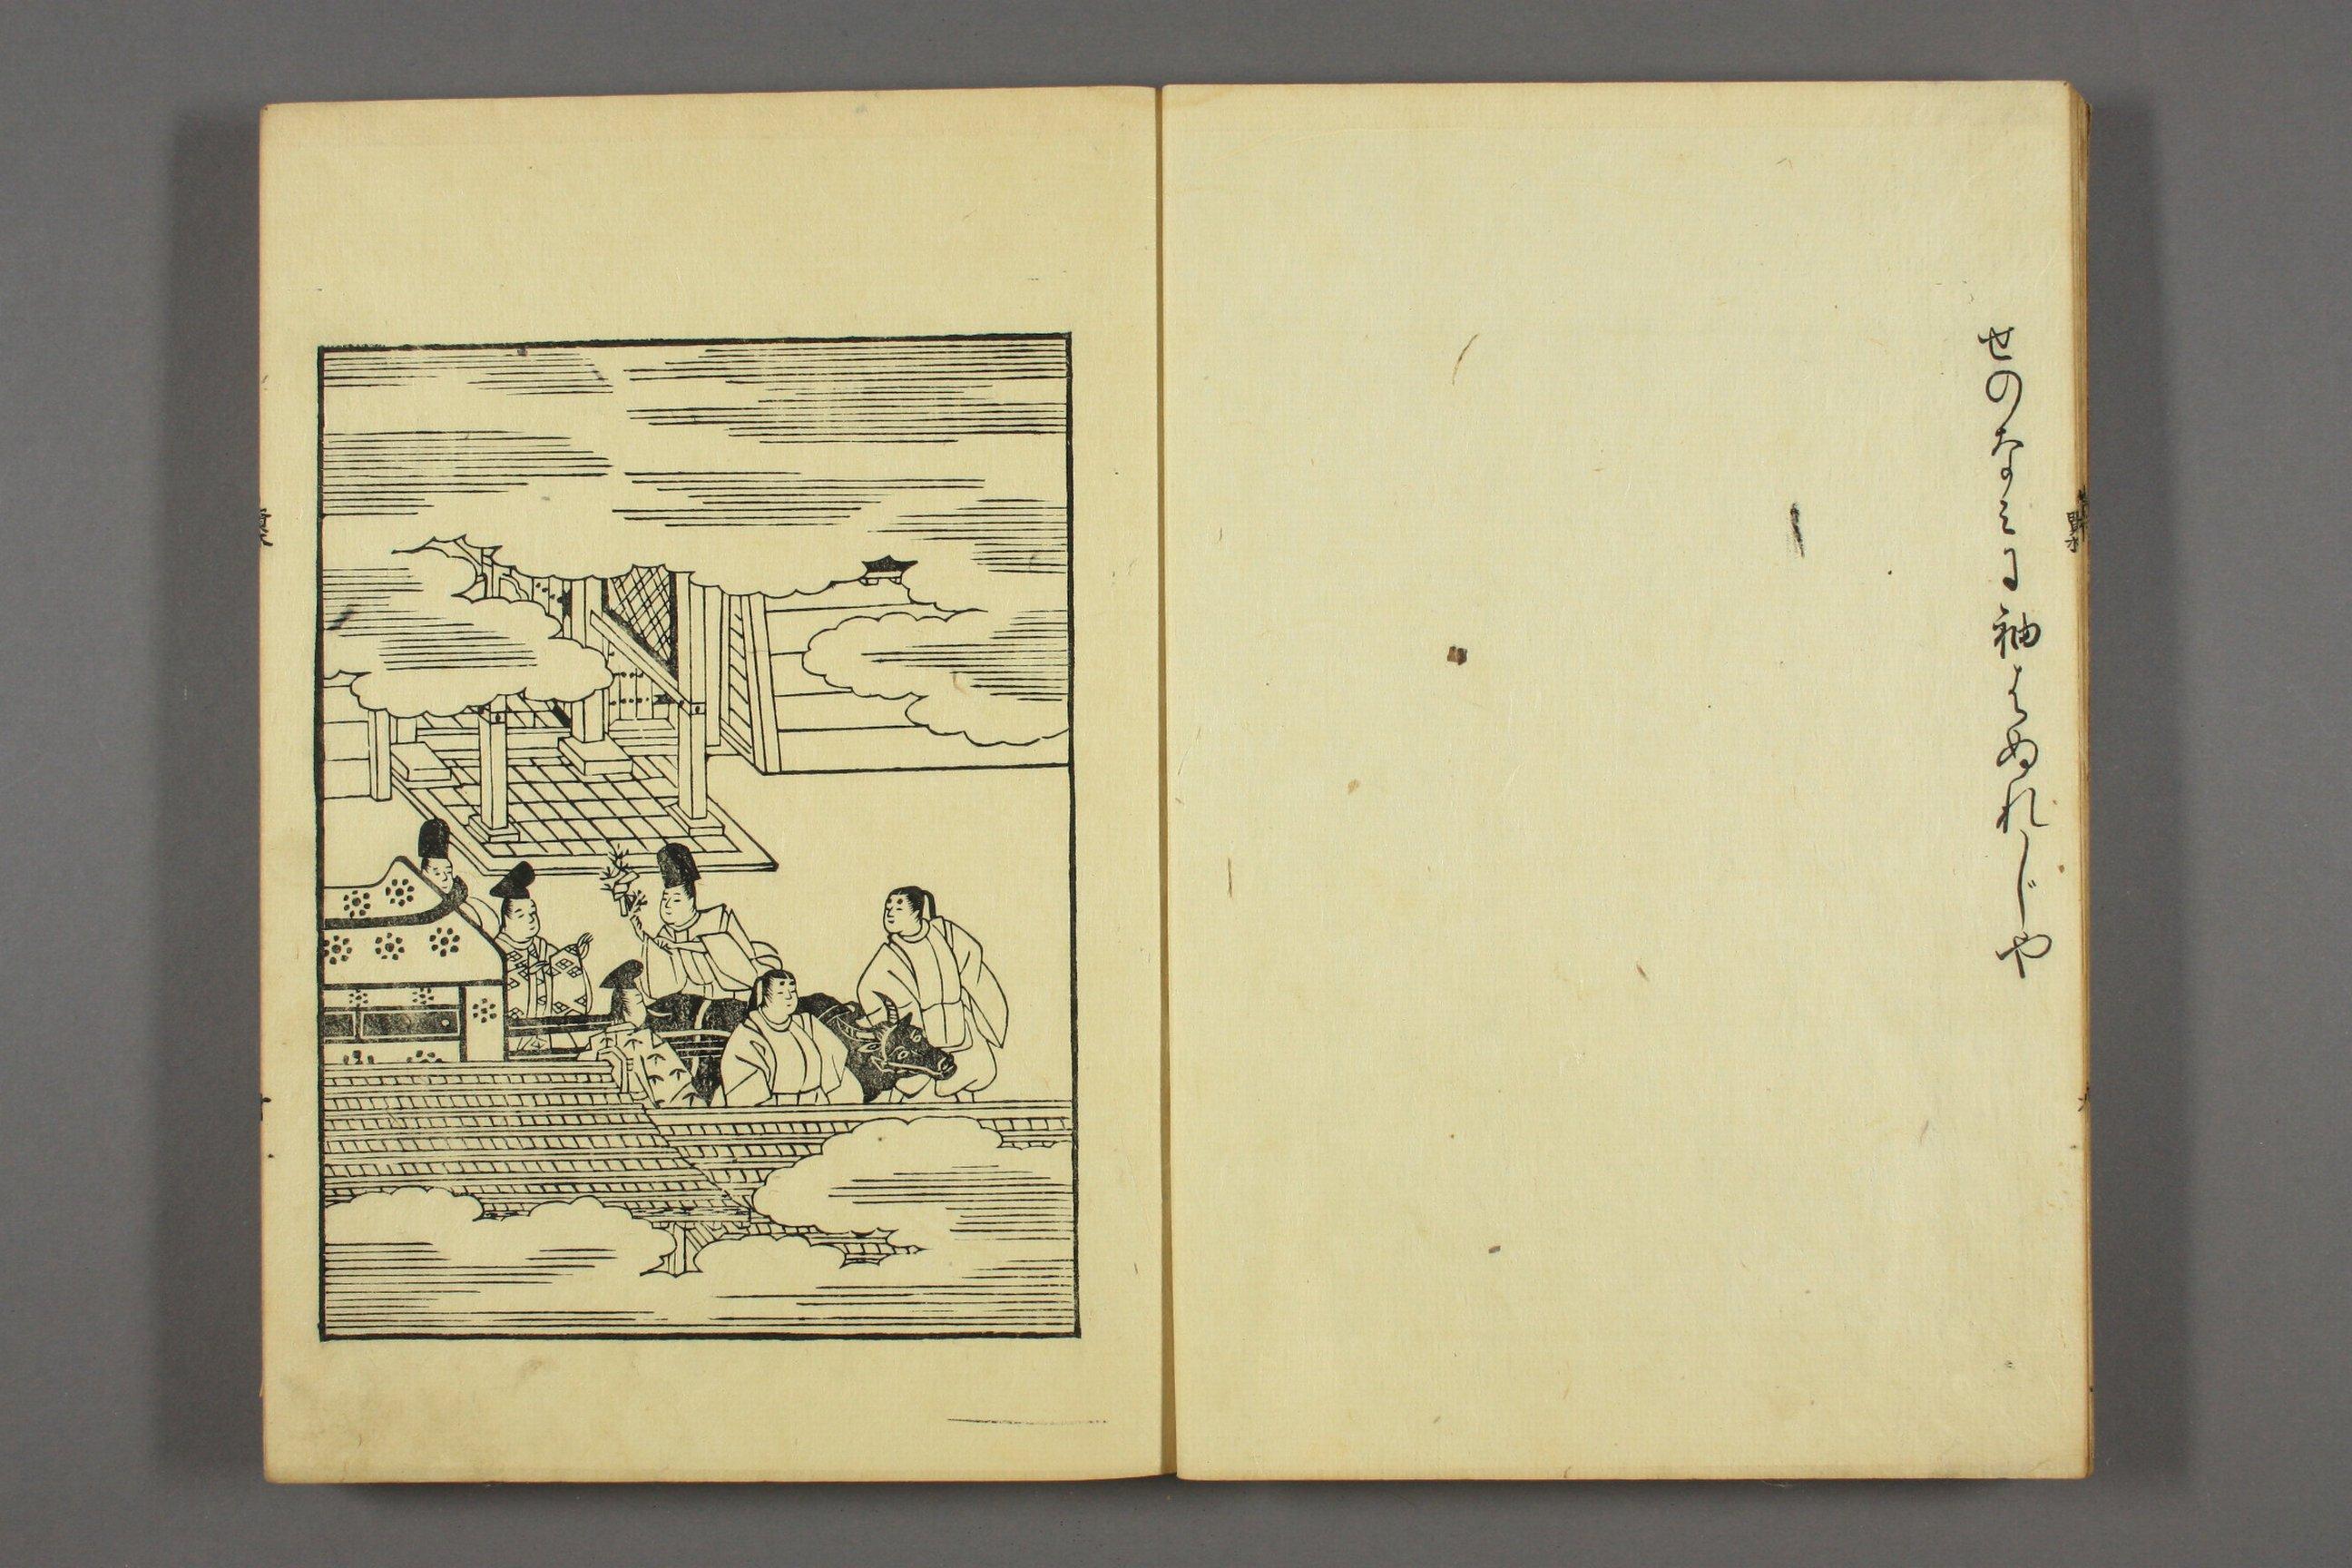 http://archive.wul.waseda.ac.jp/kosho/bunko30/bunko30_a0007/bunko30_a0007_0010/bunko30_a0007_0010_p0011.jpg